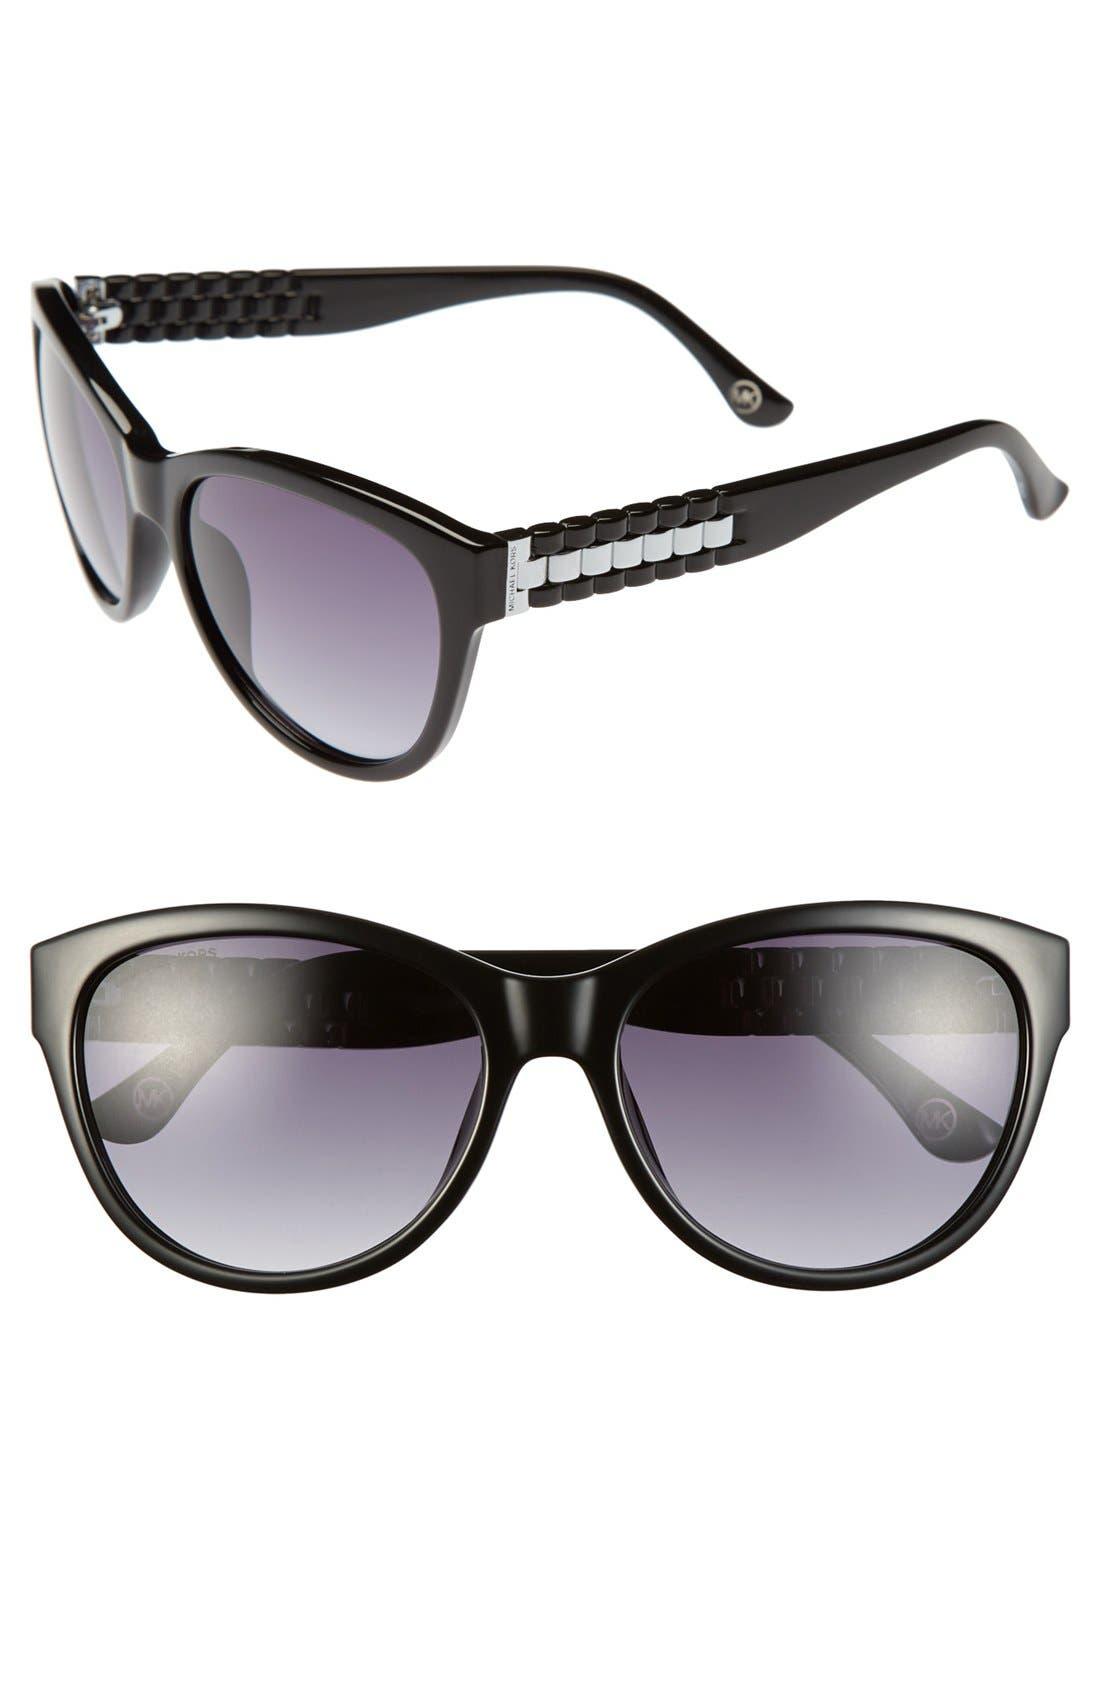 Alternate Image 1 Selected - MICHAEL Michael Kors 'Olivia' 57mm Sunglasses